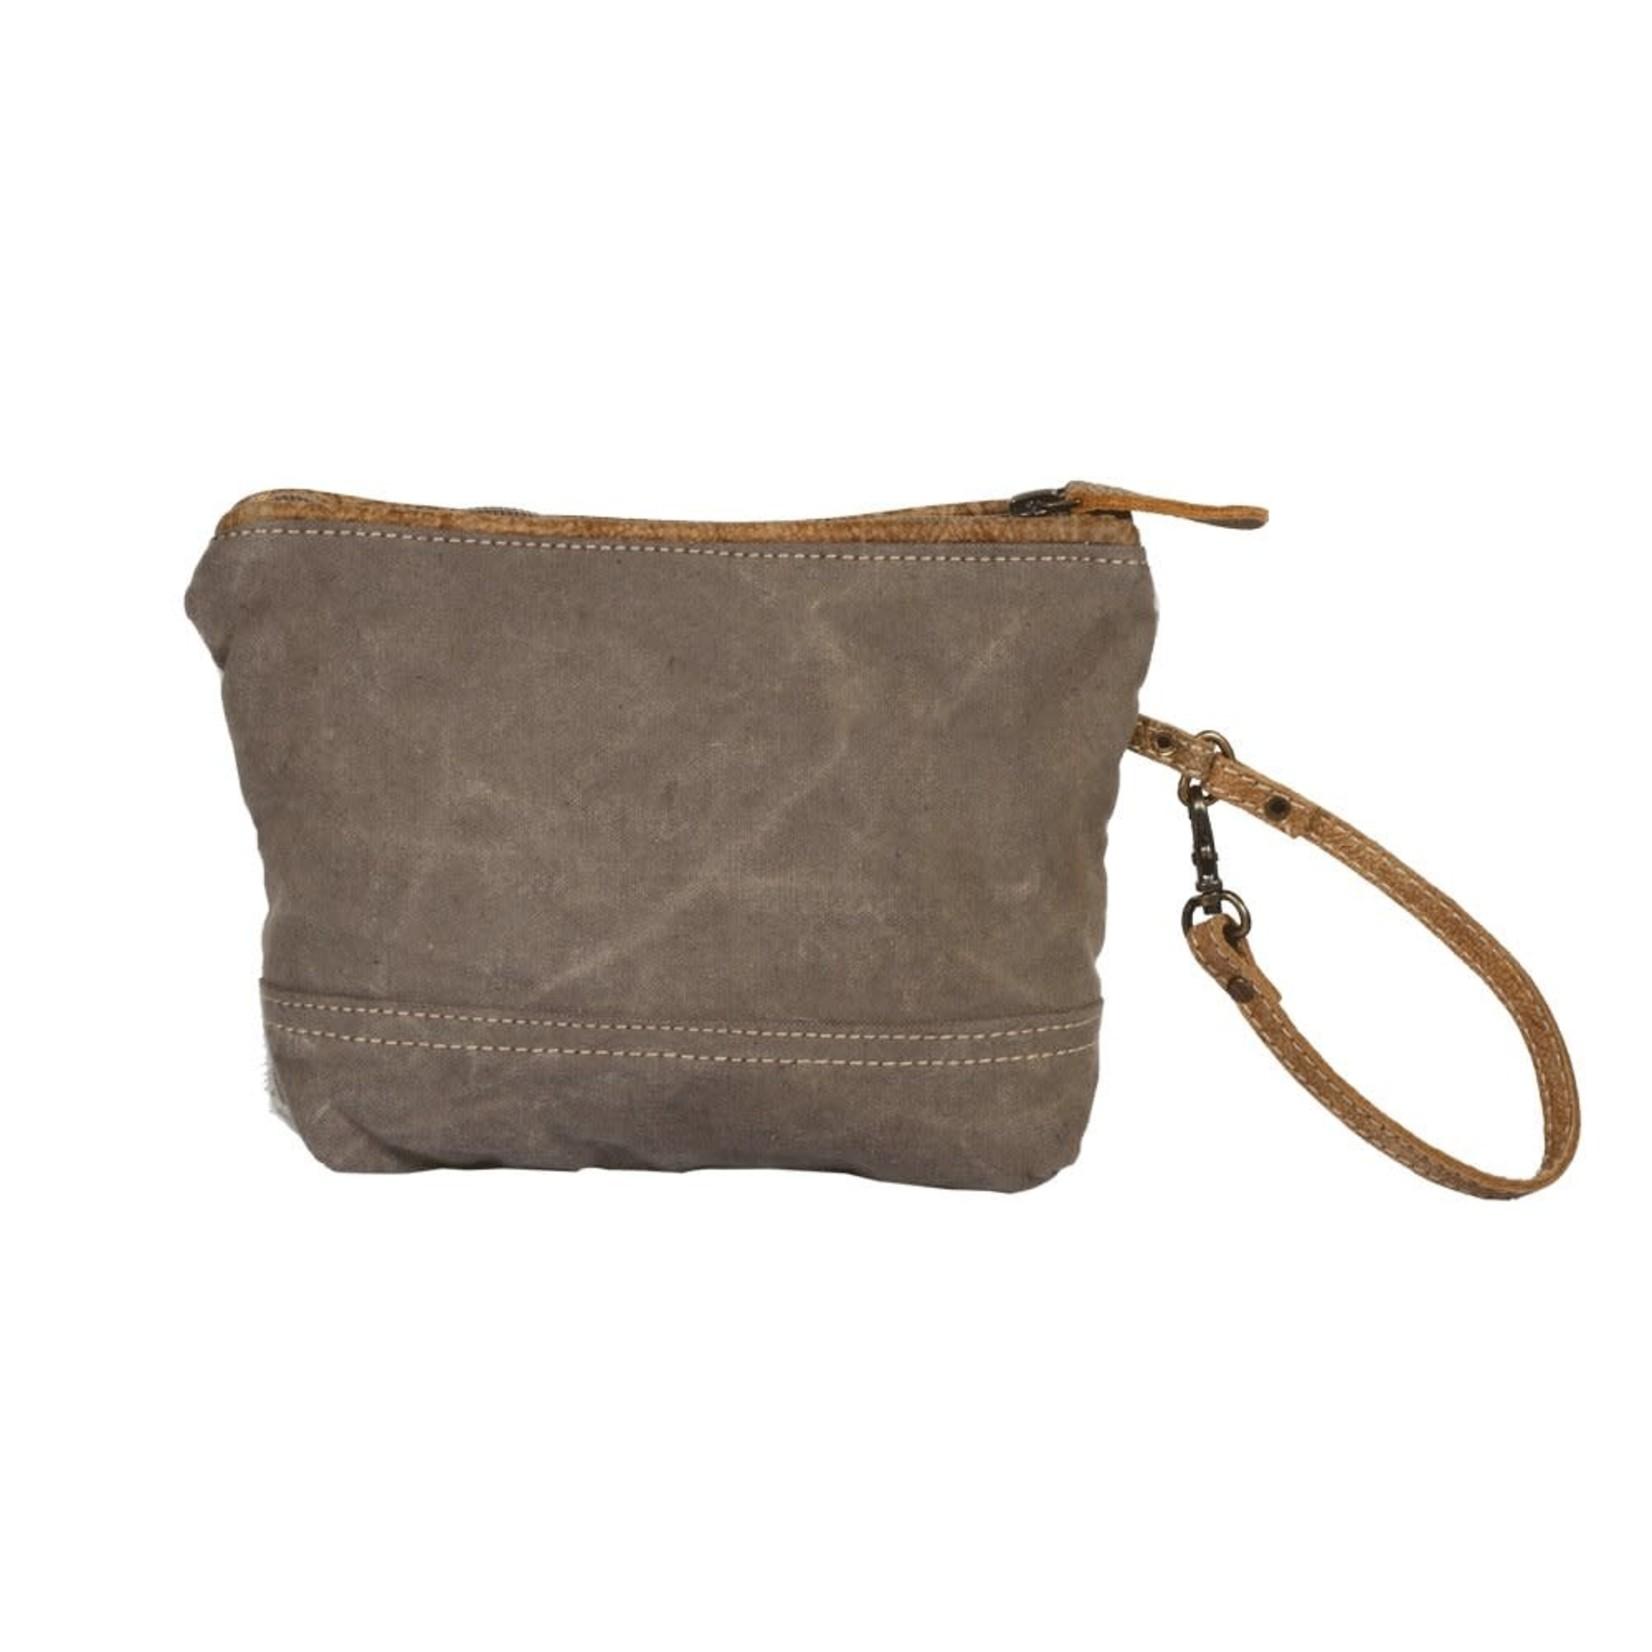 Myra Bags S-1330 Blaze Pouch / Wristlet